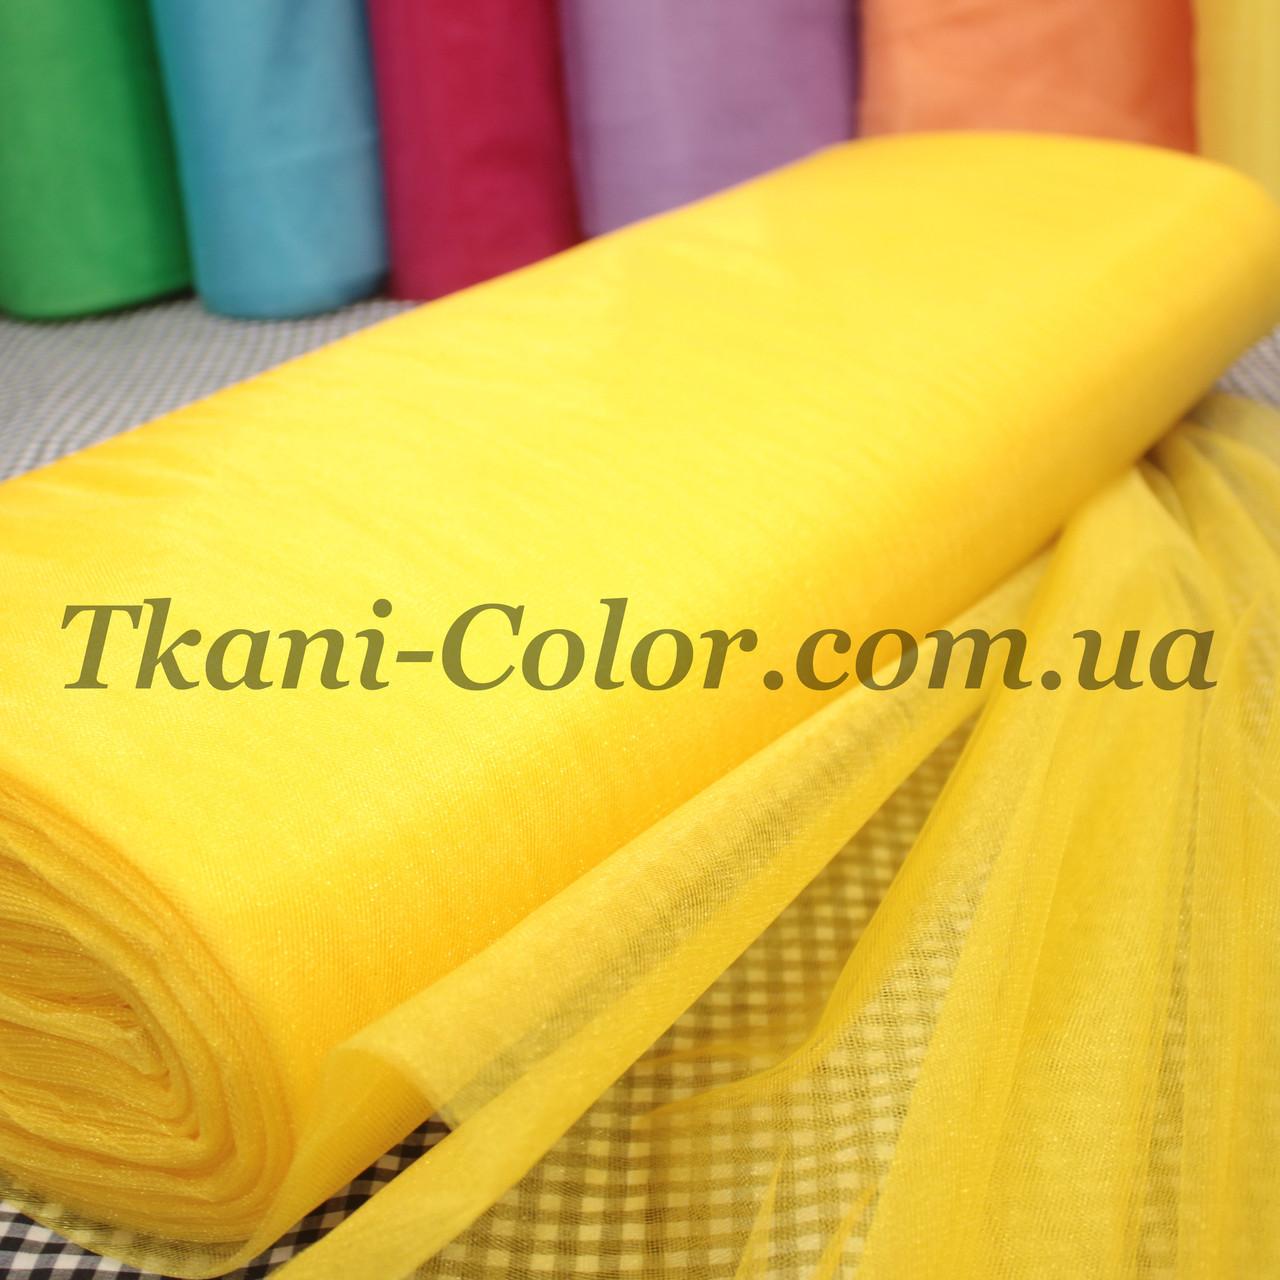 Ткань фатин средней жесткости желтый